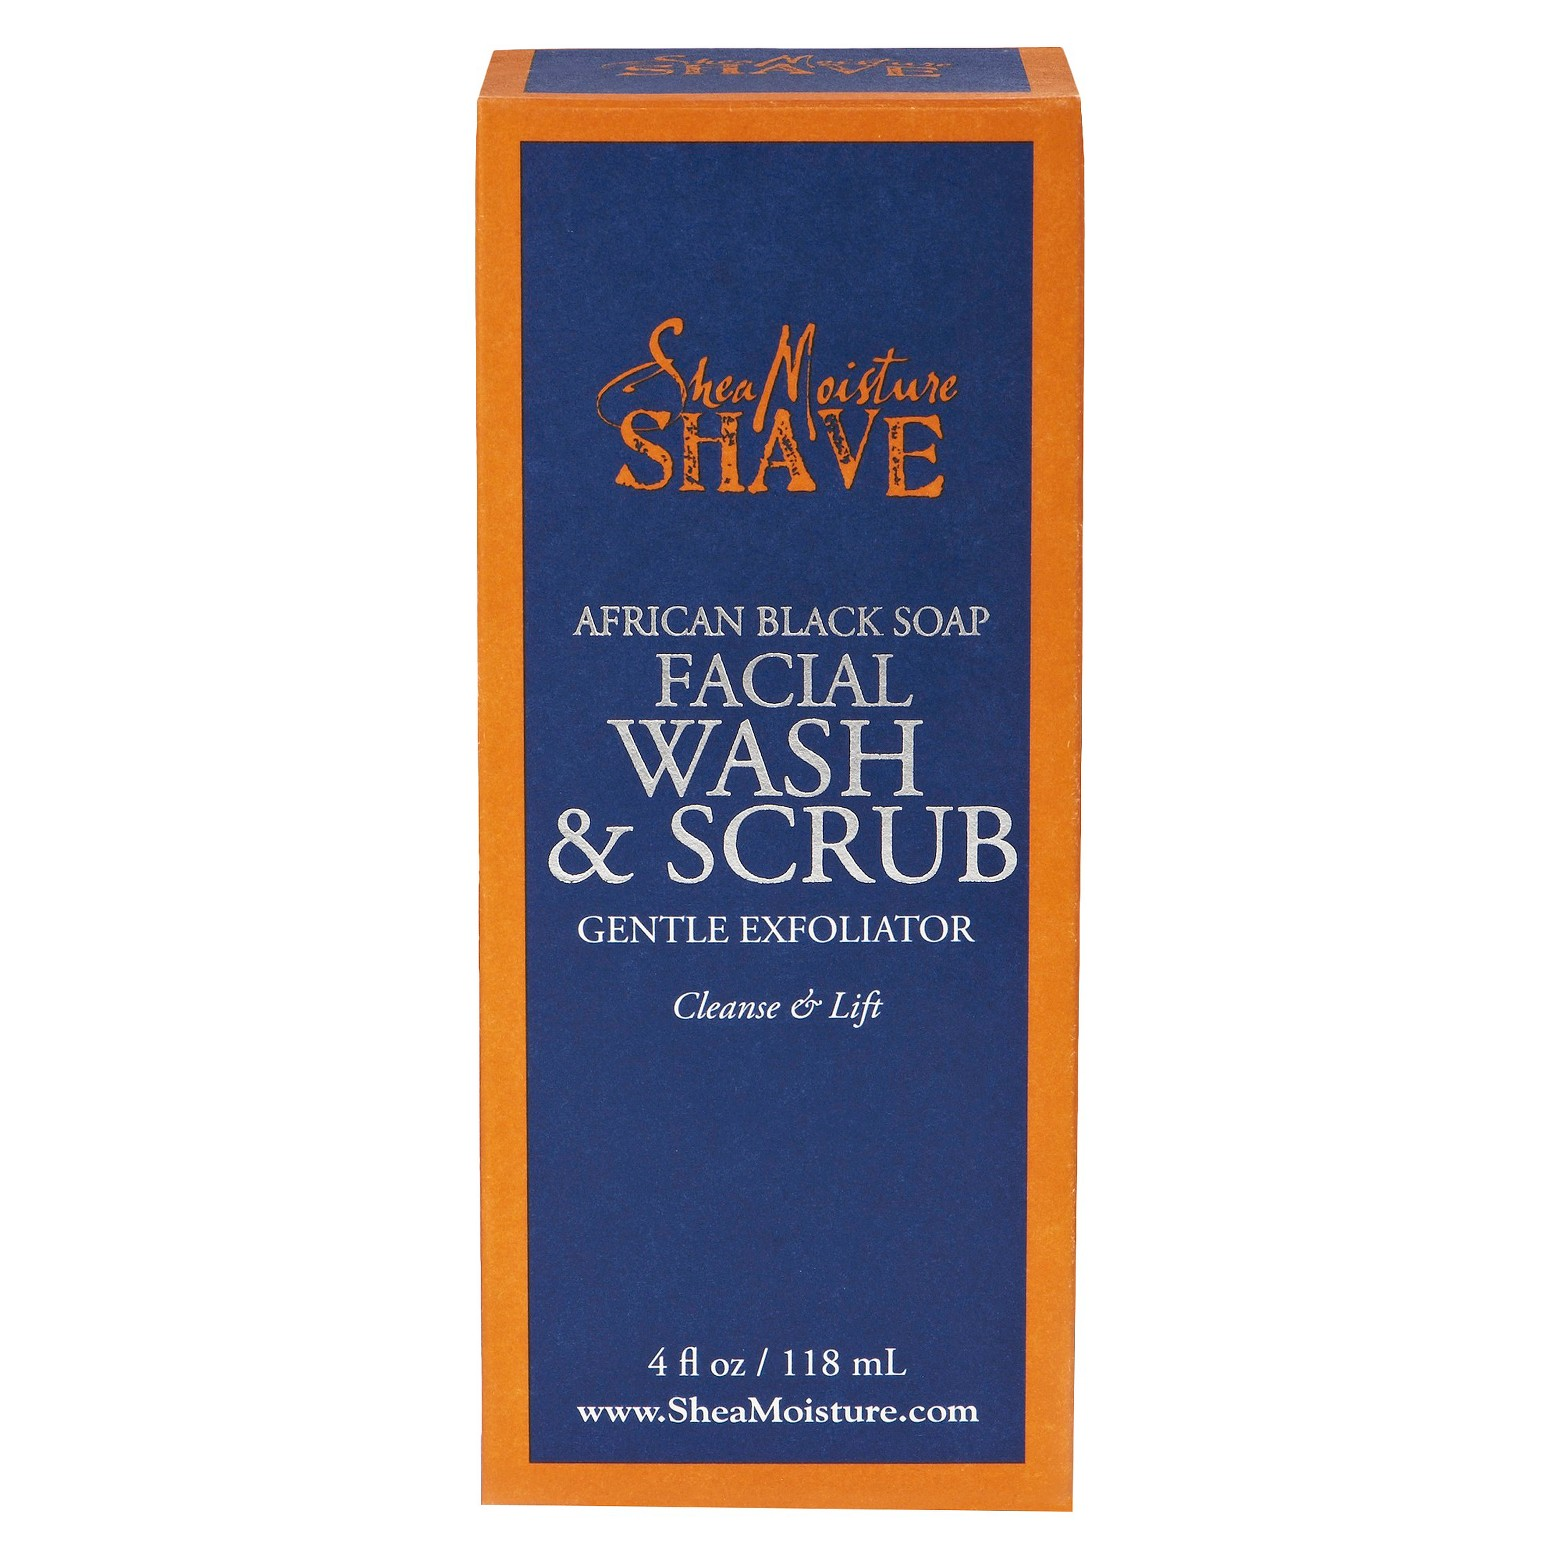 Shea Moisture Facial Wash & Scrub